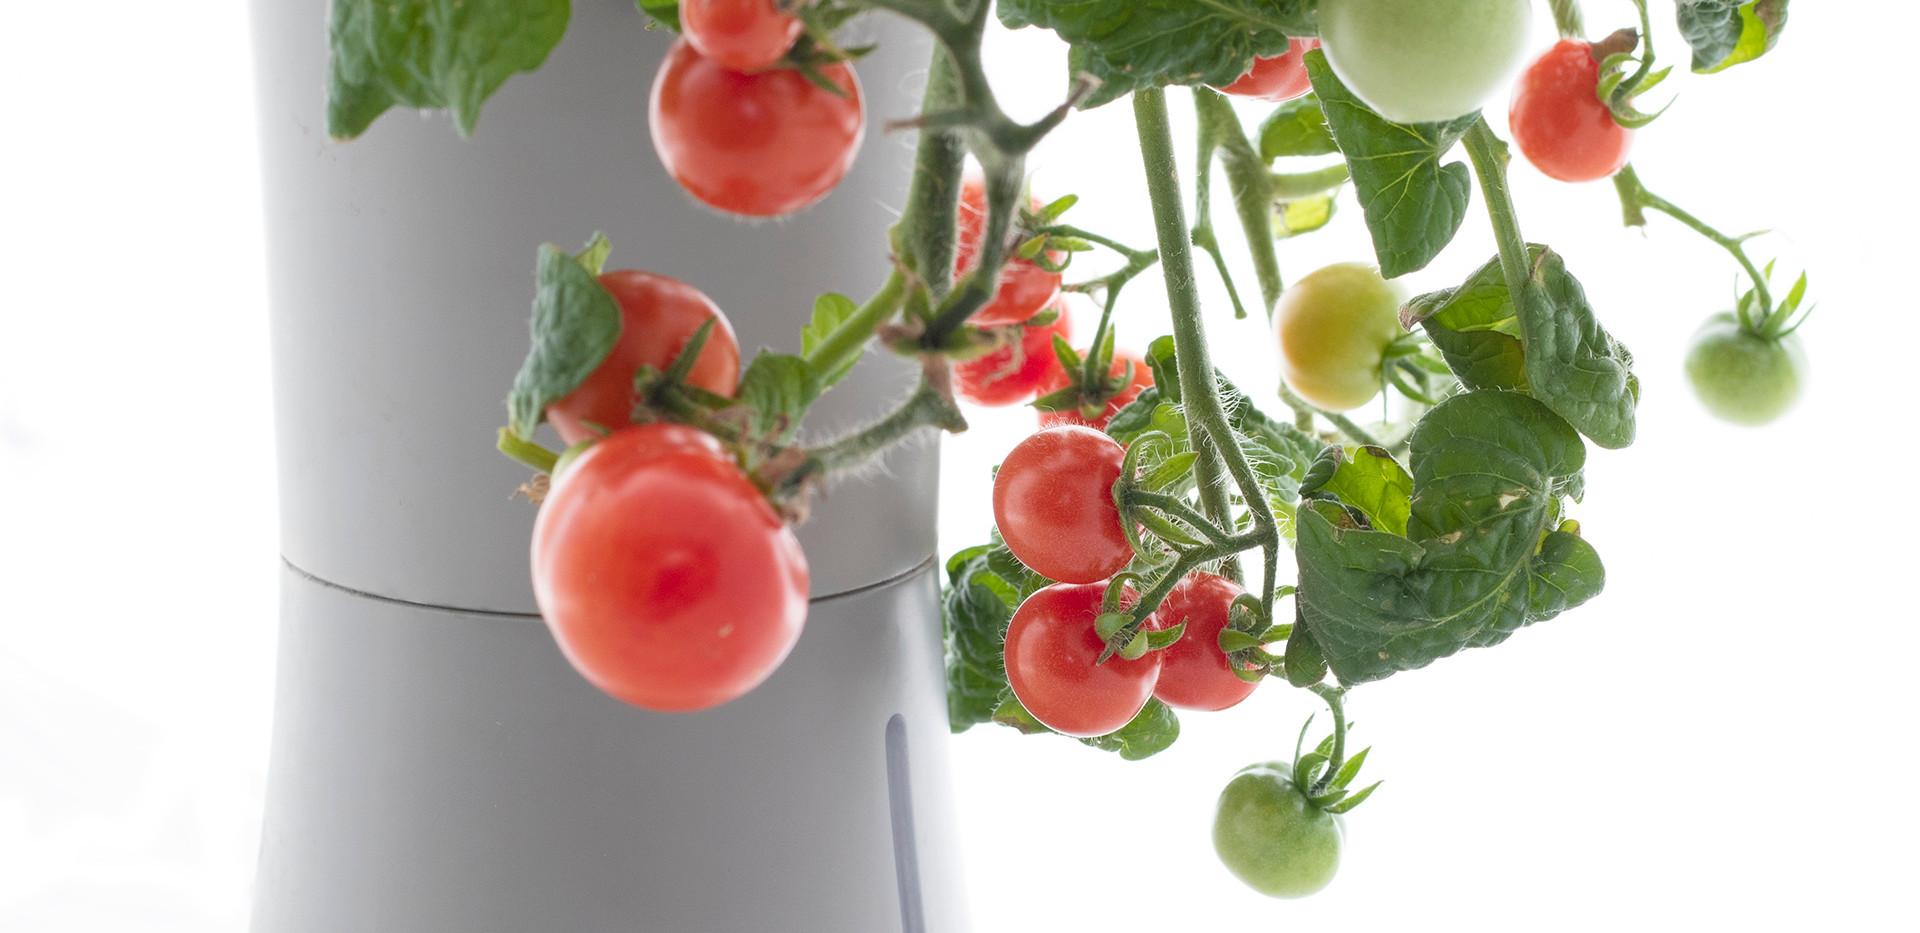 tomato_closeup.jpg